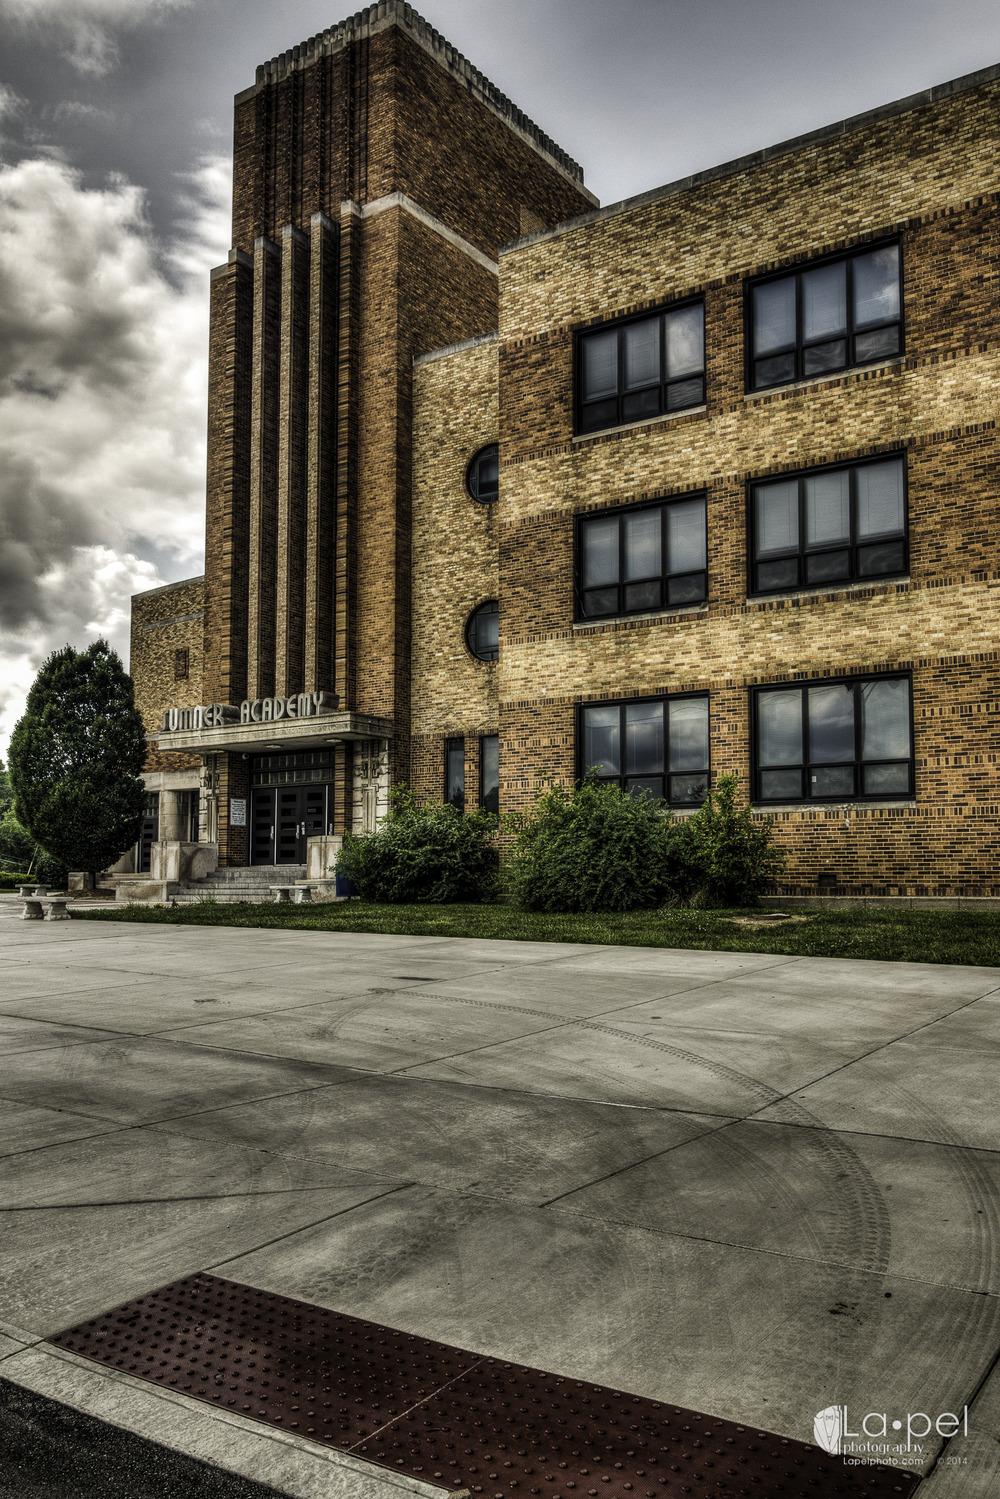 Sumner Academy4